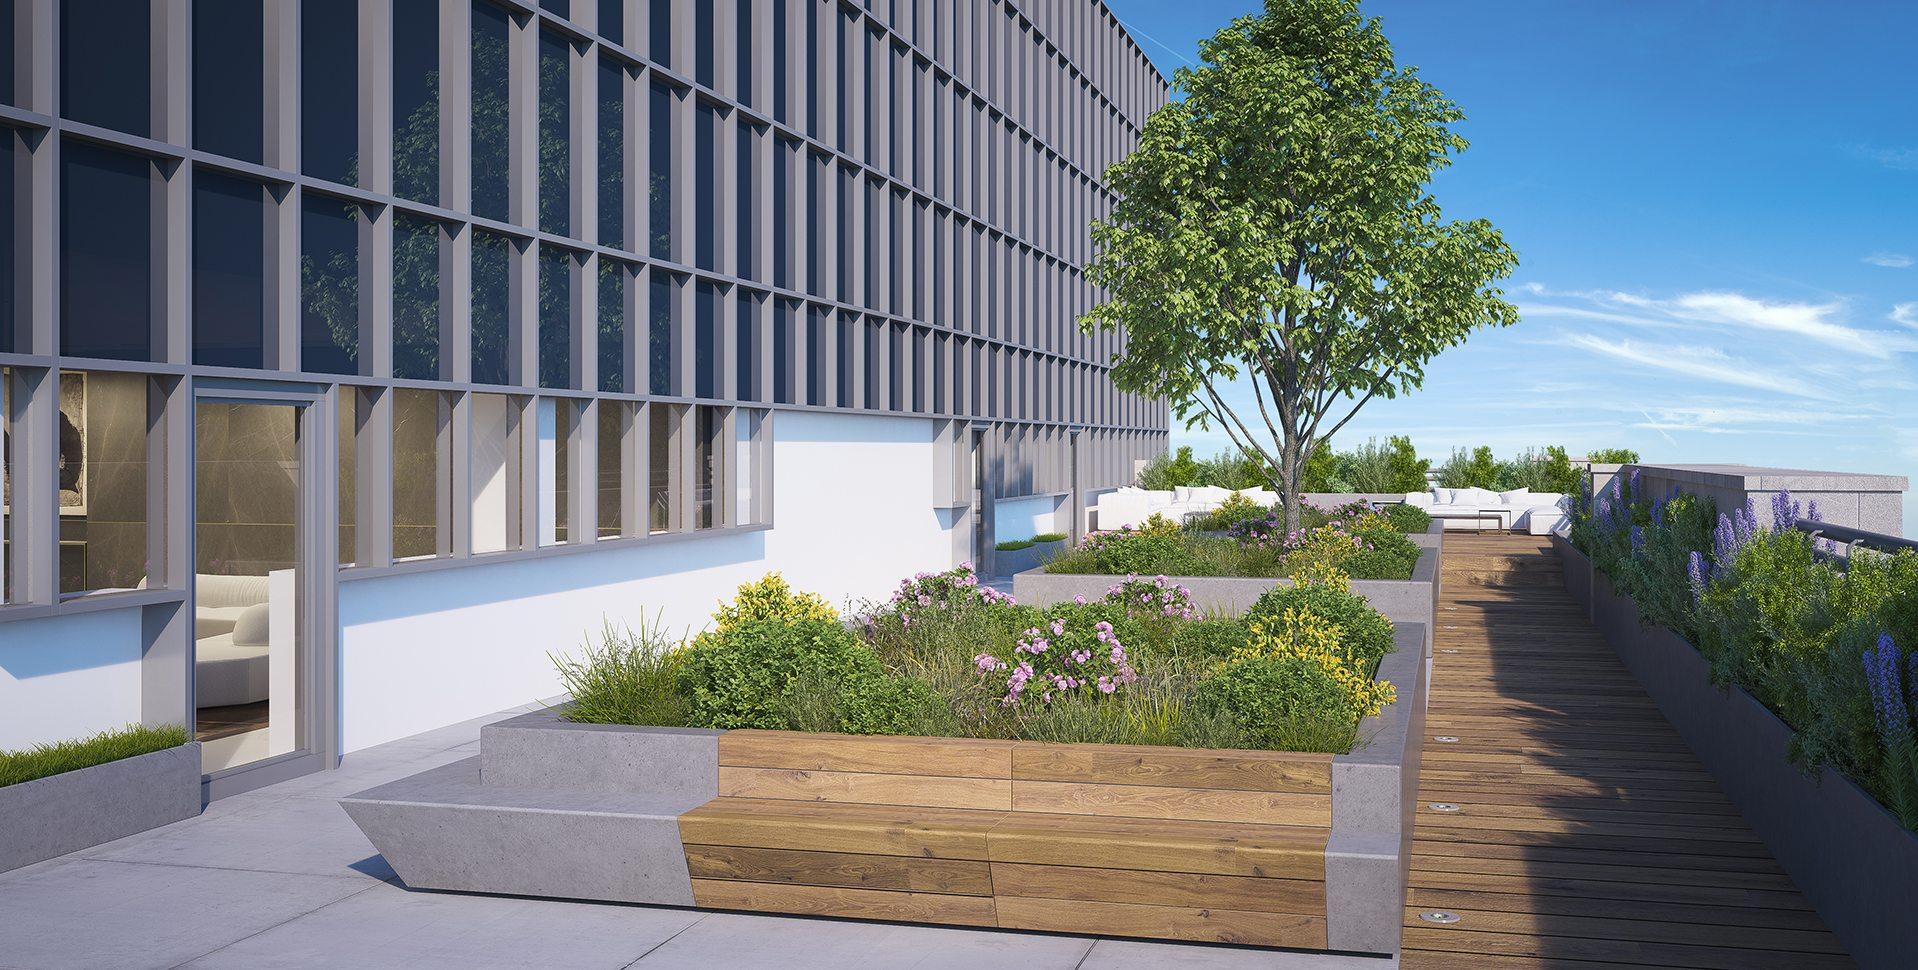 Architectural Visualization: Exterior Balcony